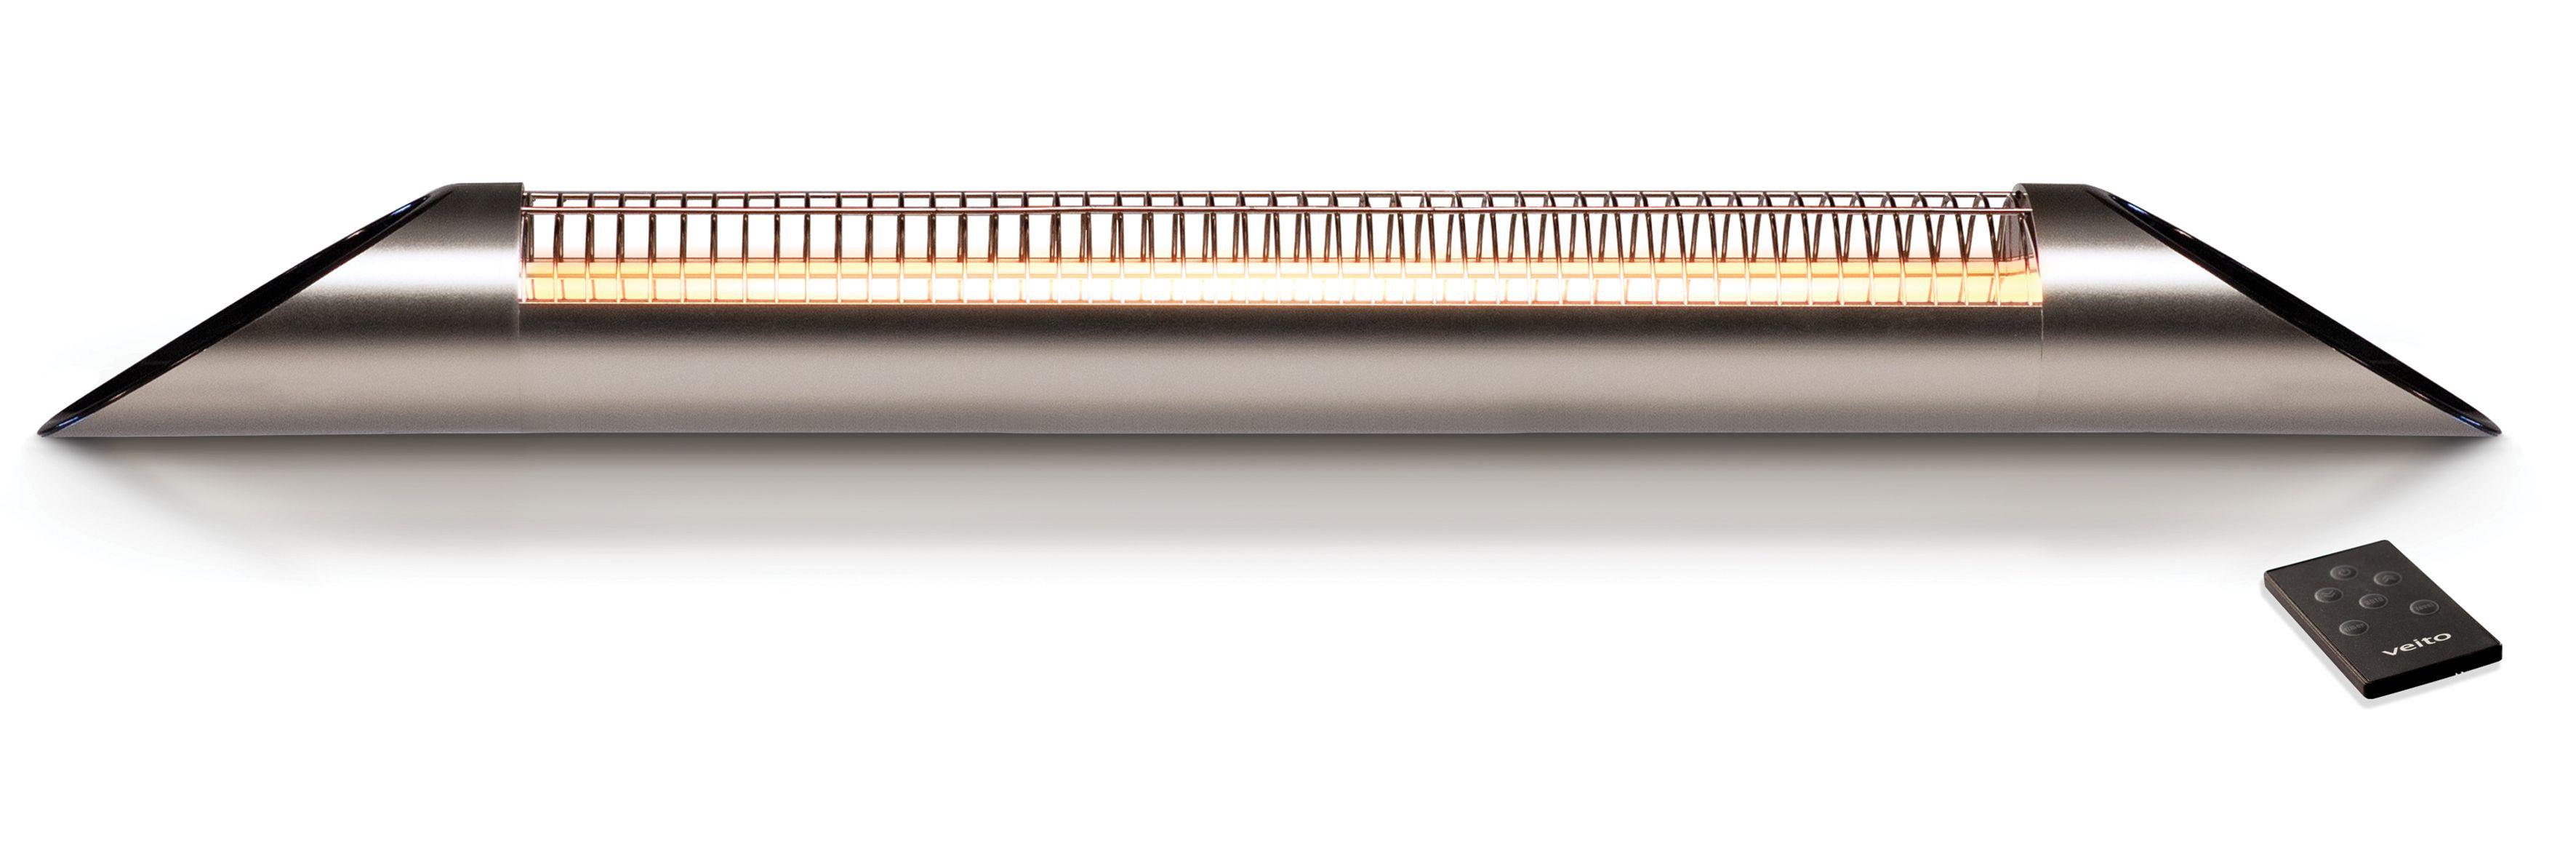 Heizstrahler Badezimmer Amazon | Blade Veito Blade Veito Pinterest Blade